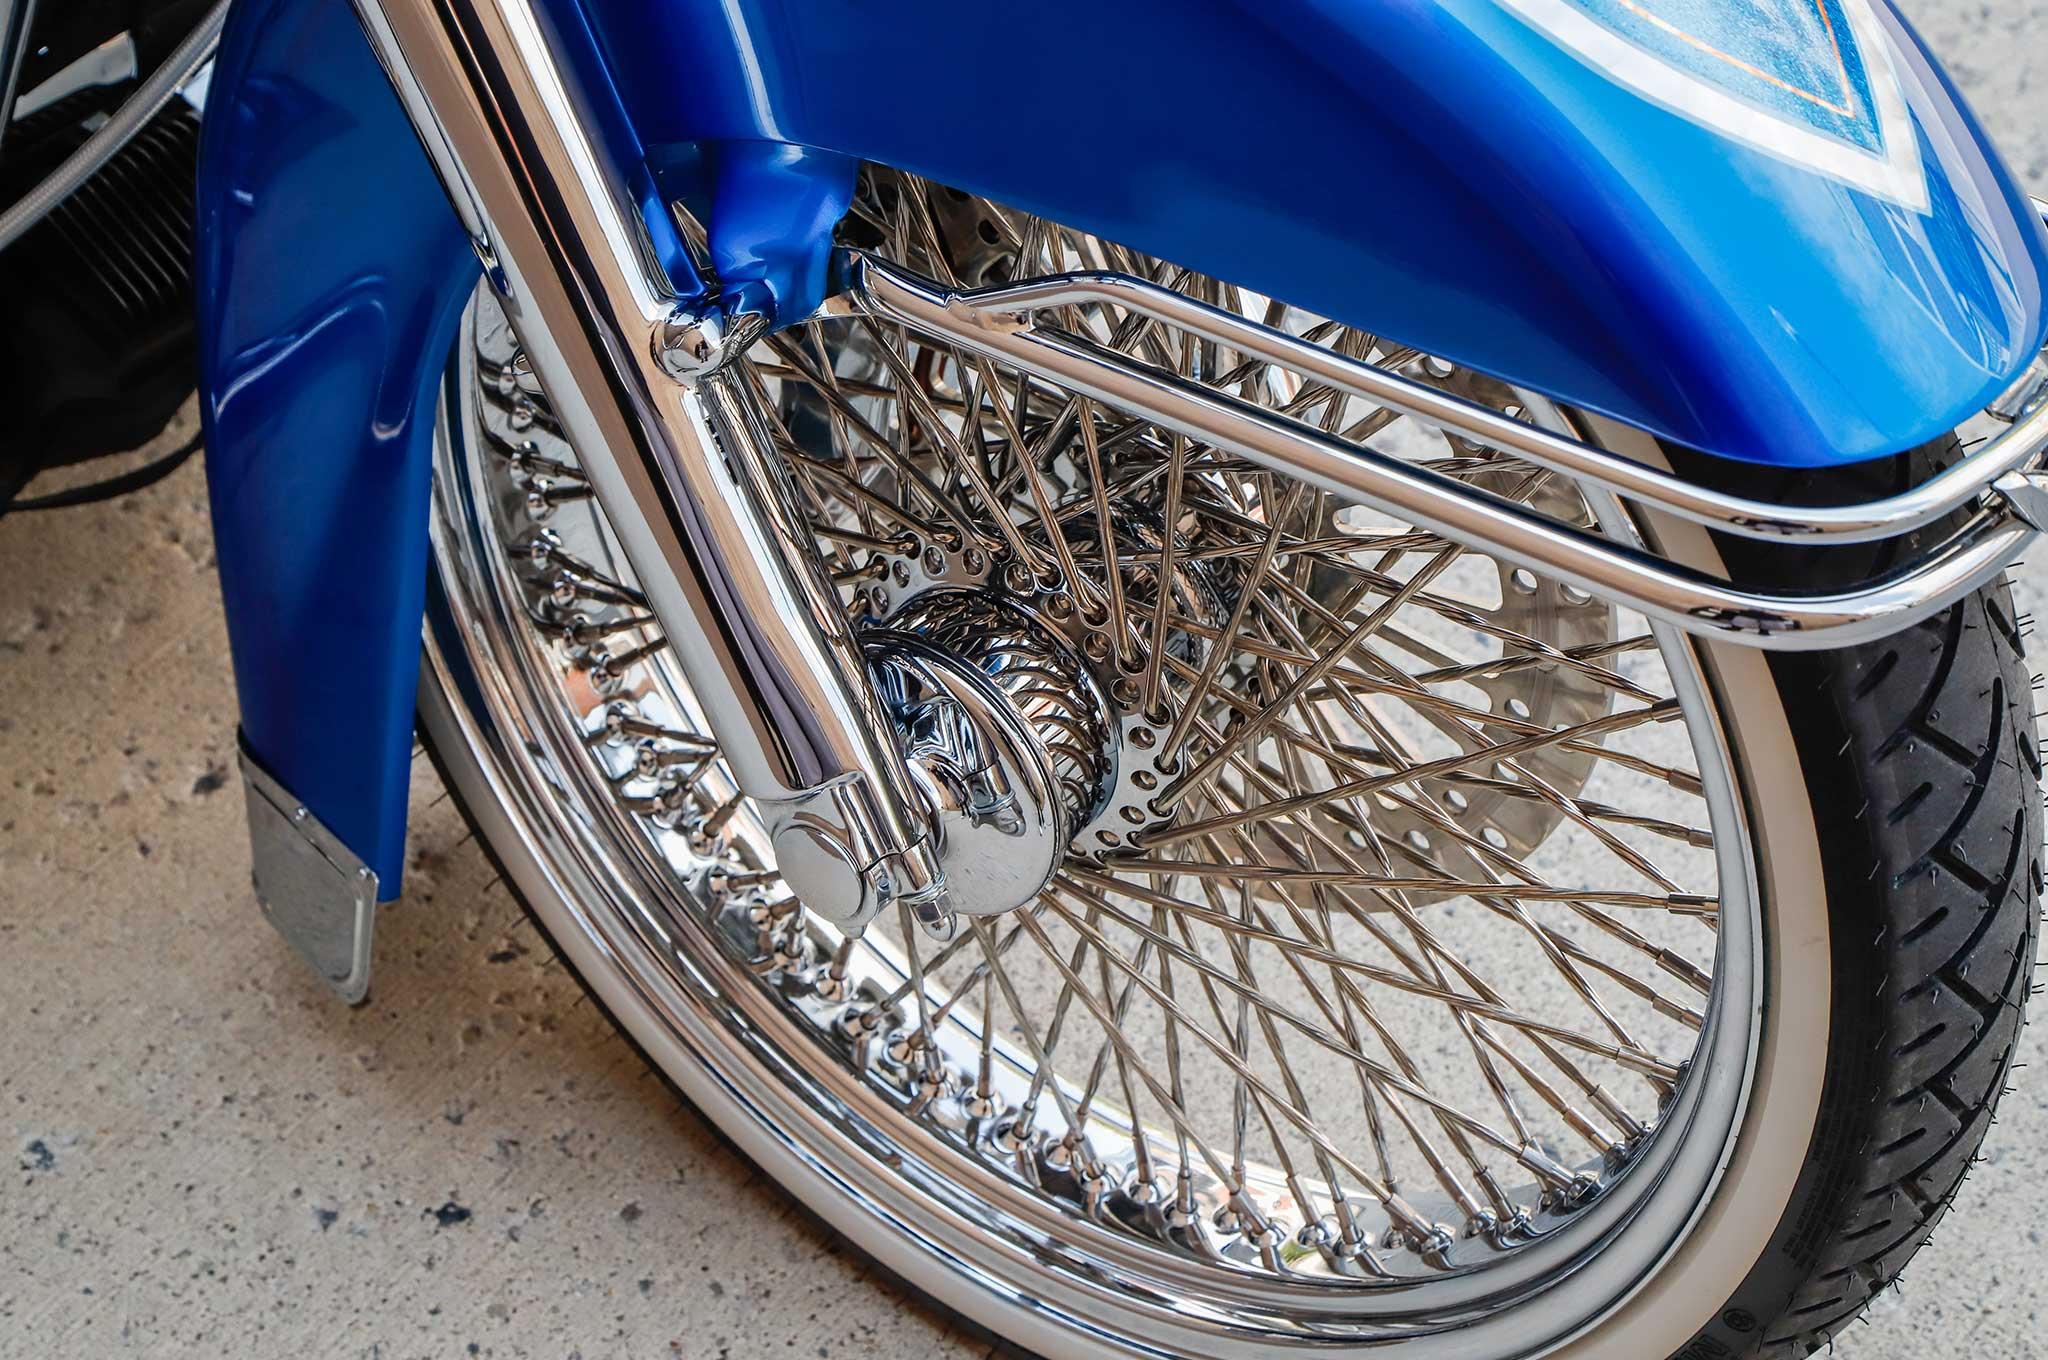 Harley Davidson Cruiser >> 2001 Harley Davidson Road King DNA Twisted Spoke Wheel - Lowrider